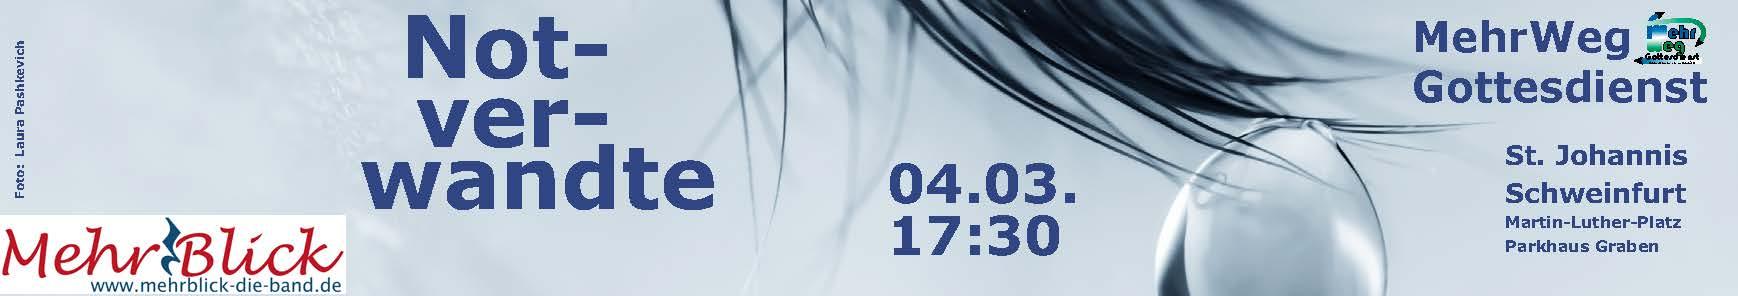 MWG1803-Banner-schmal-Web.jpg